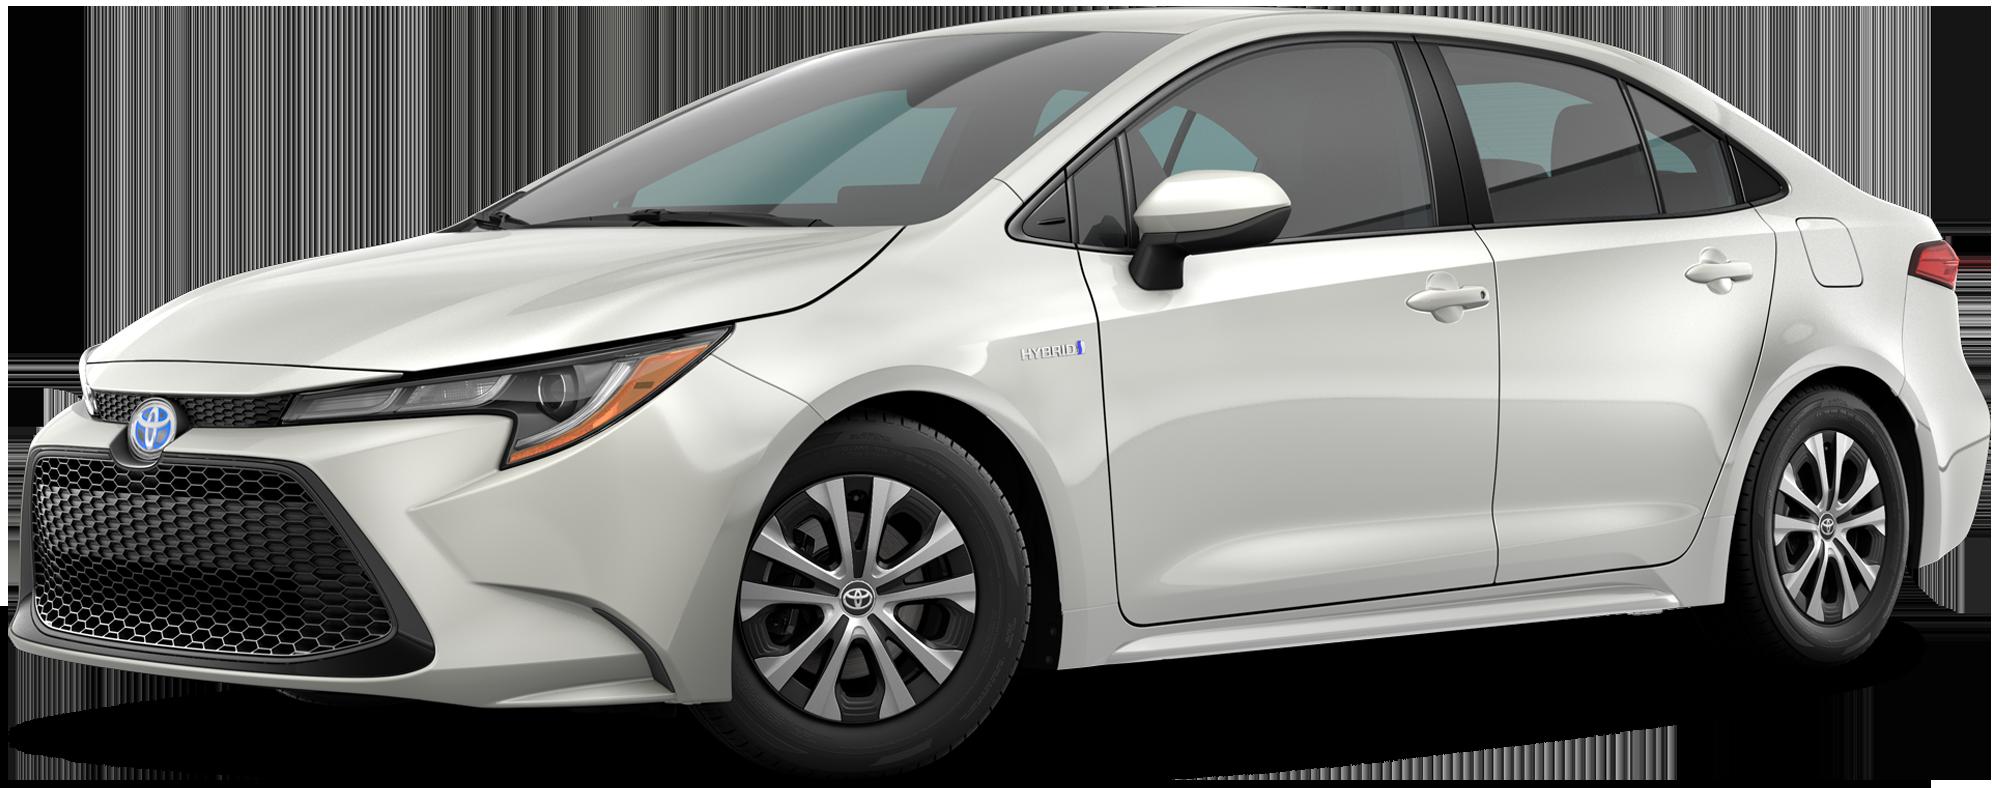 Toyota Dealerships Dfw >> Toyota Of Denton New Used Toyota Dealer Near Lewisville